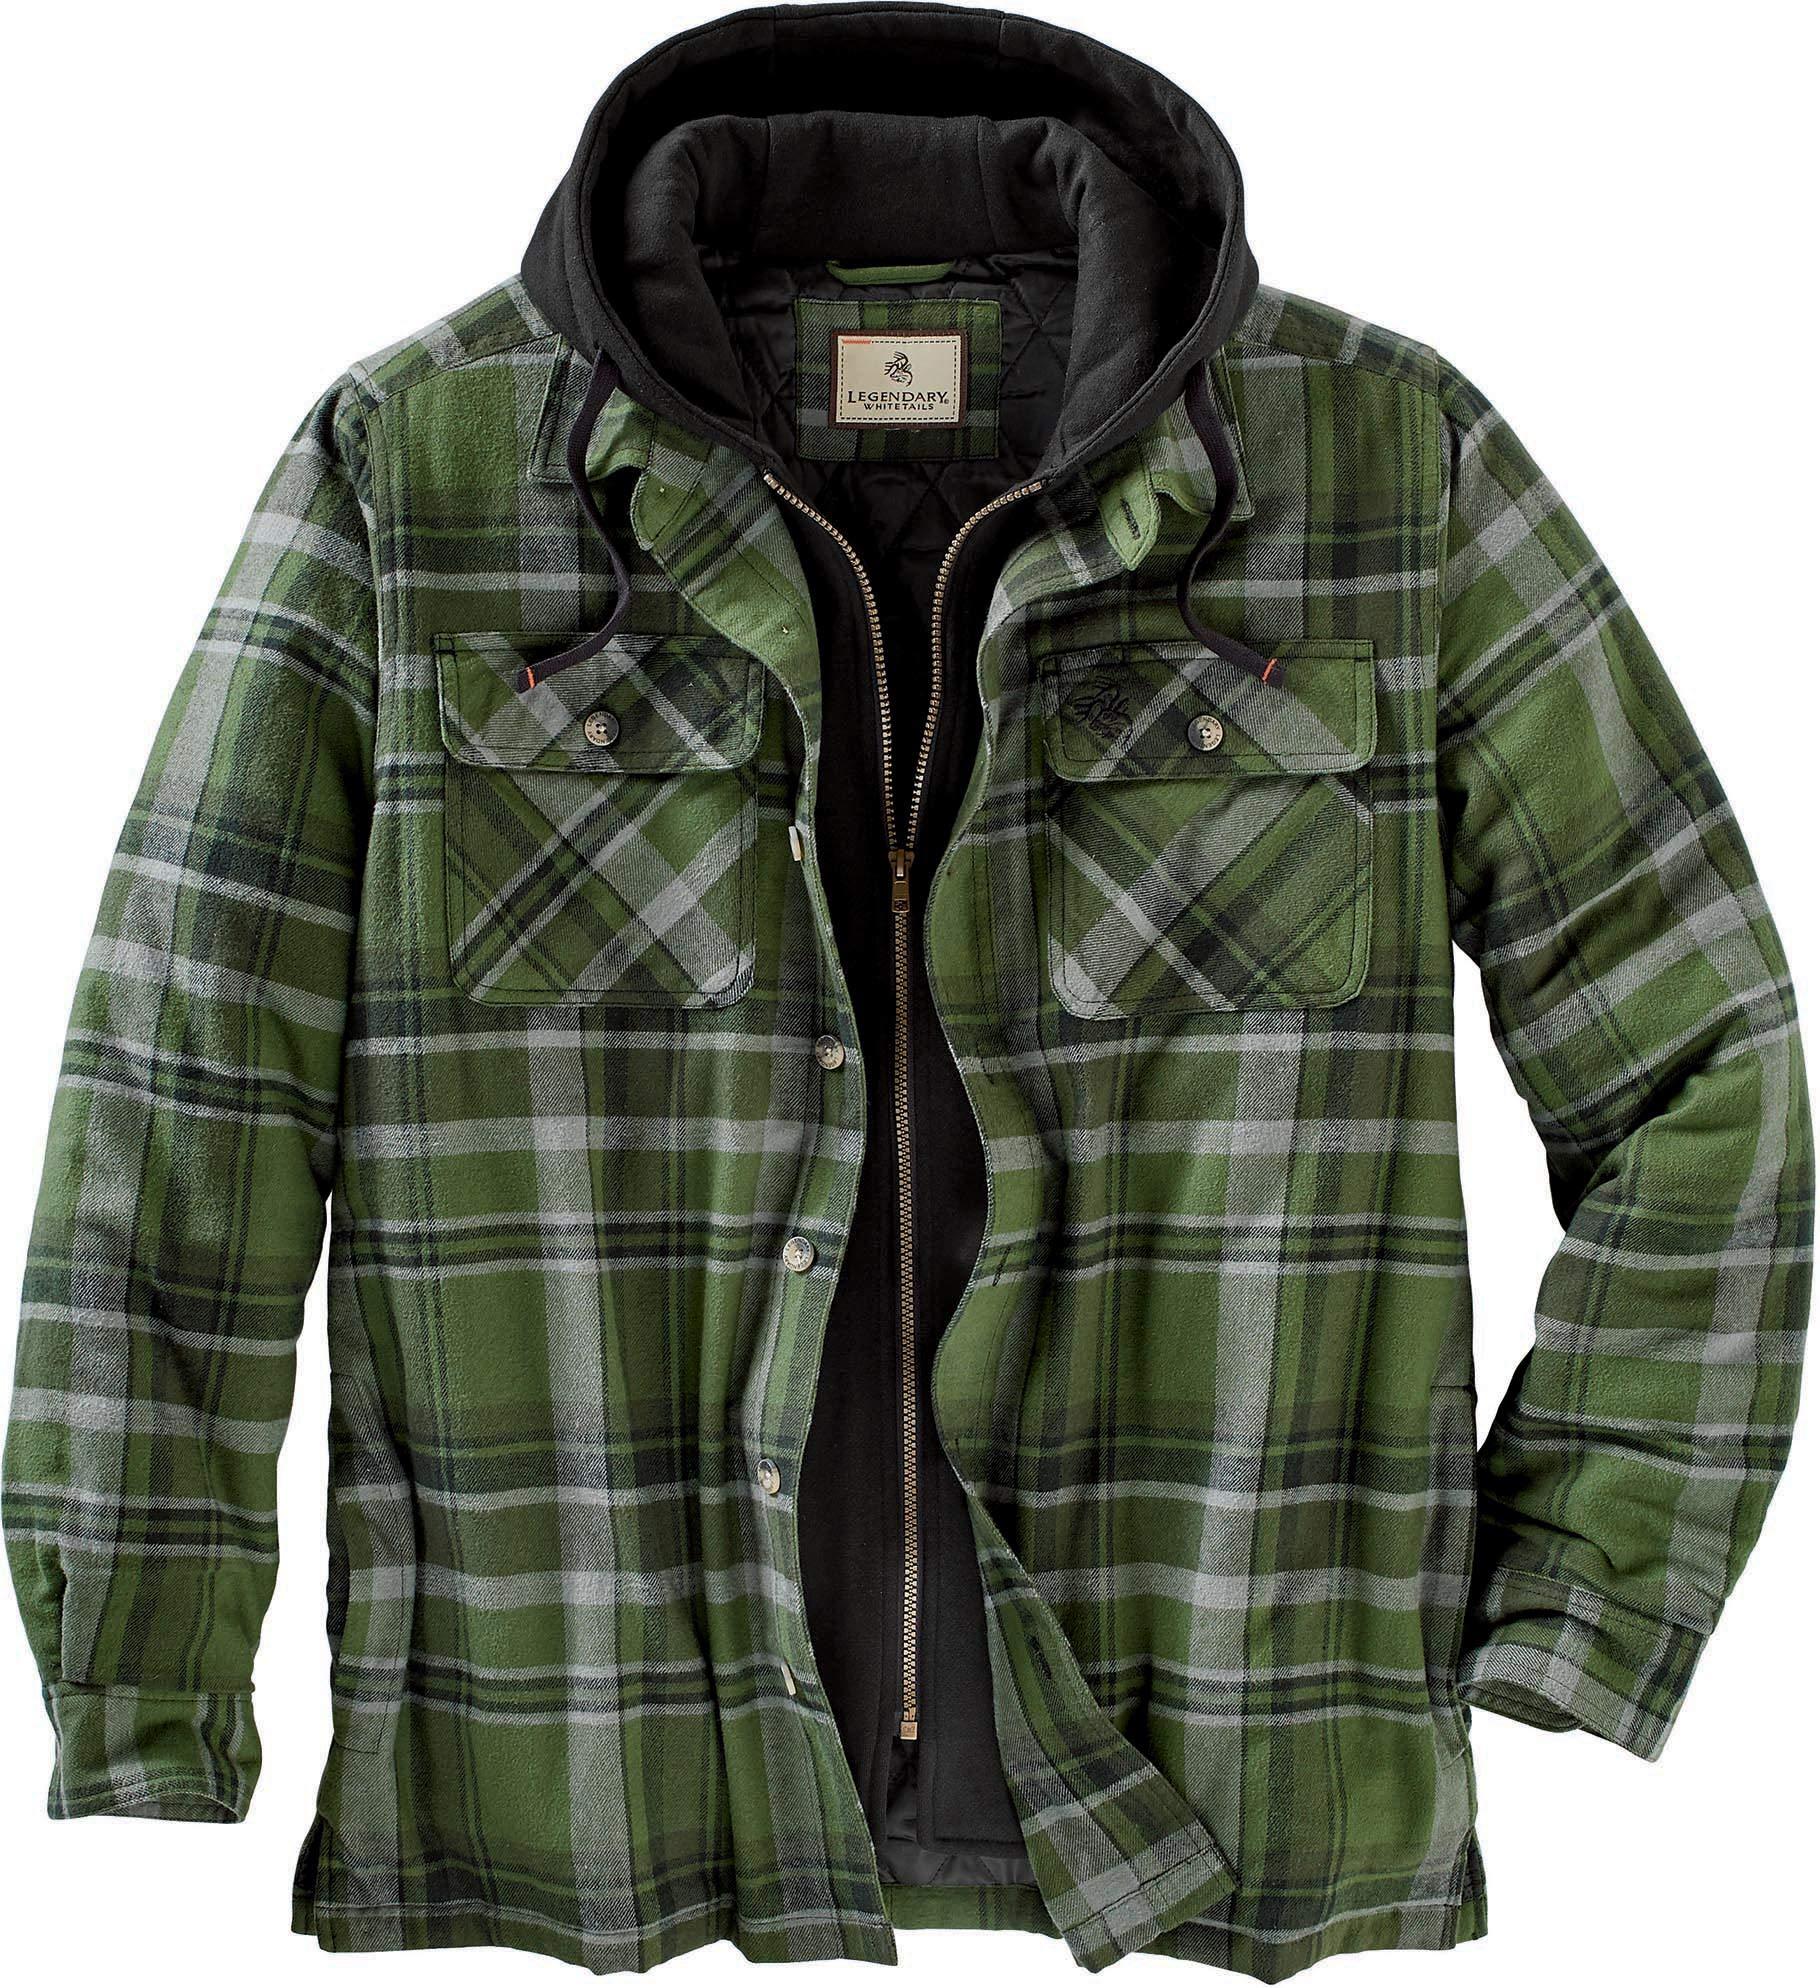 Legendary Whitetails Maplewood Hooded Shirt Jacket, Army Green Plaid, Large by Legendary Whitetails